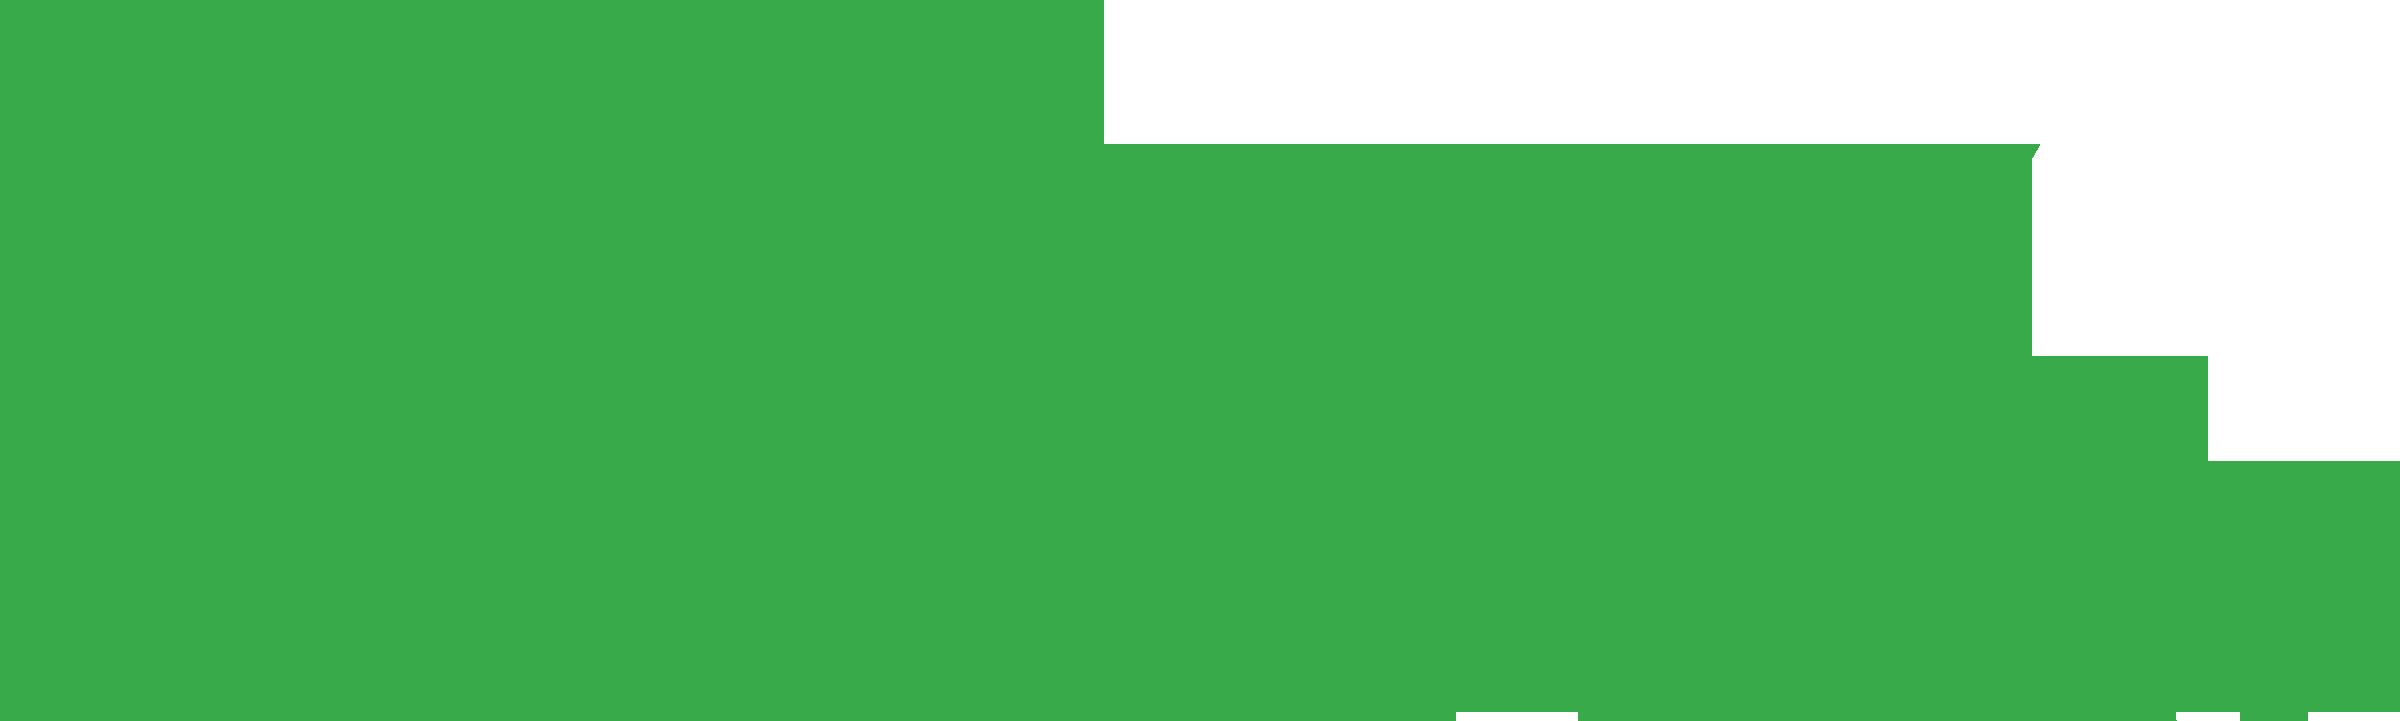 Forexfaktory